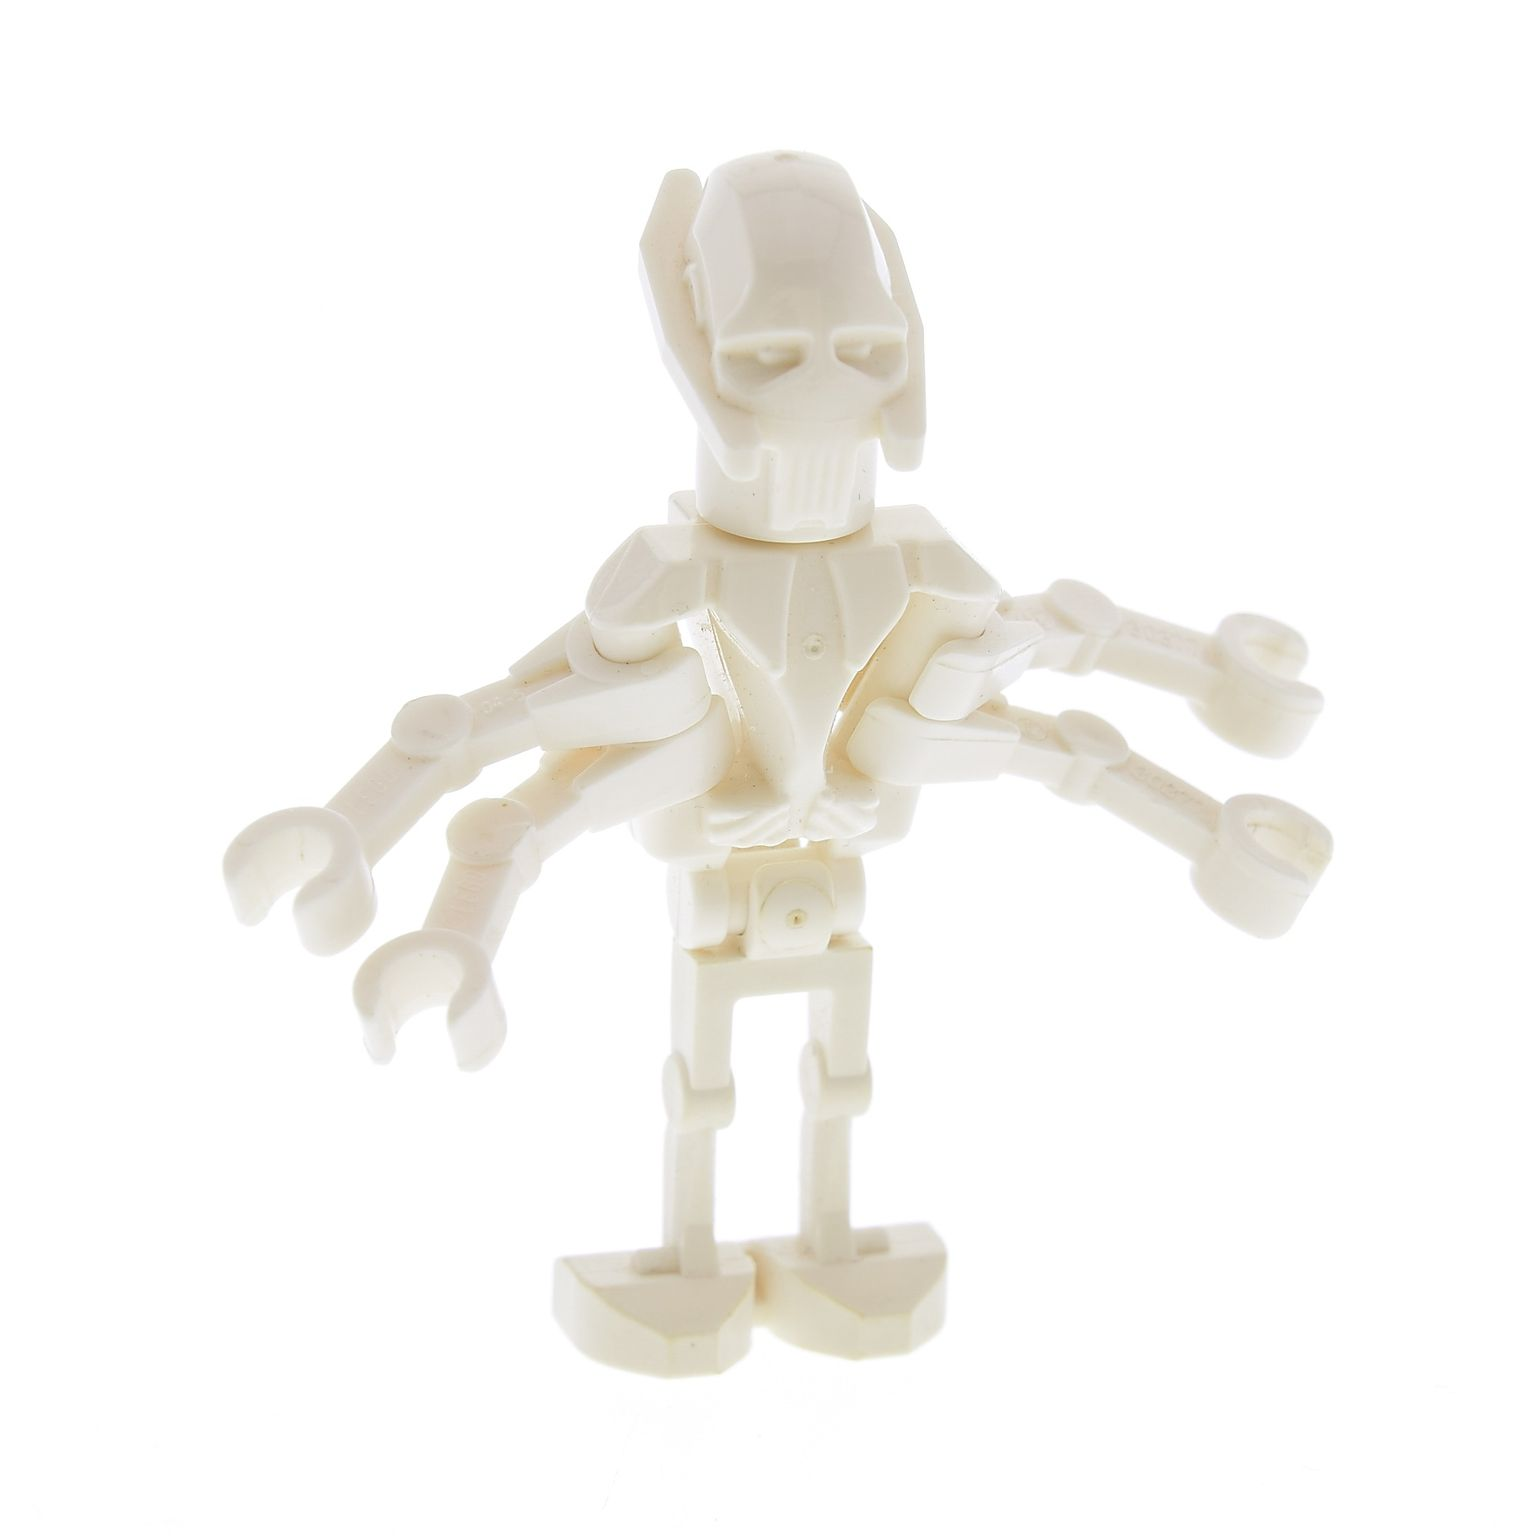 Head Modified LEGO Star Wars Minifigure White General Grievous